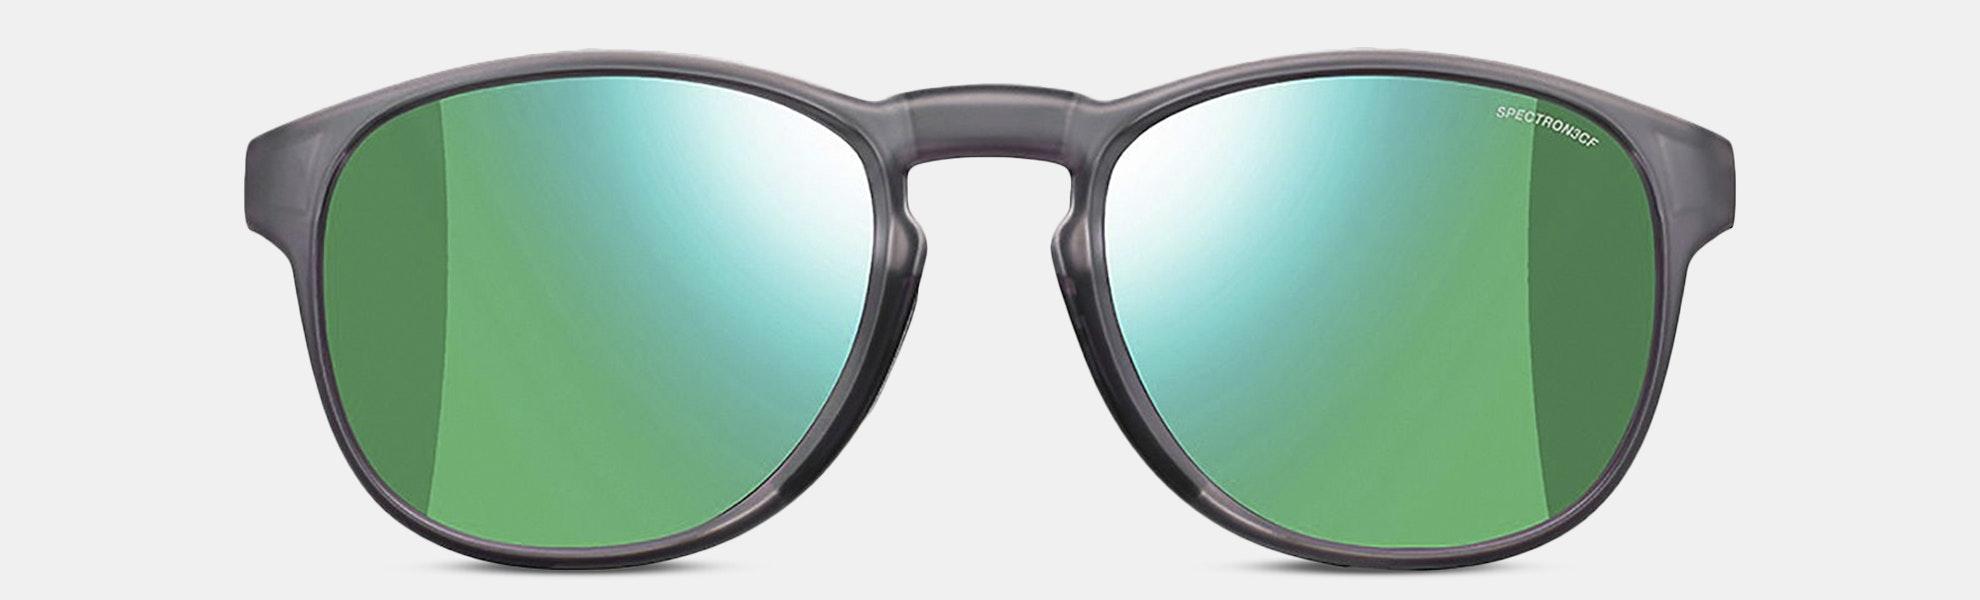 Julbo Resist Sunglasses